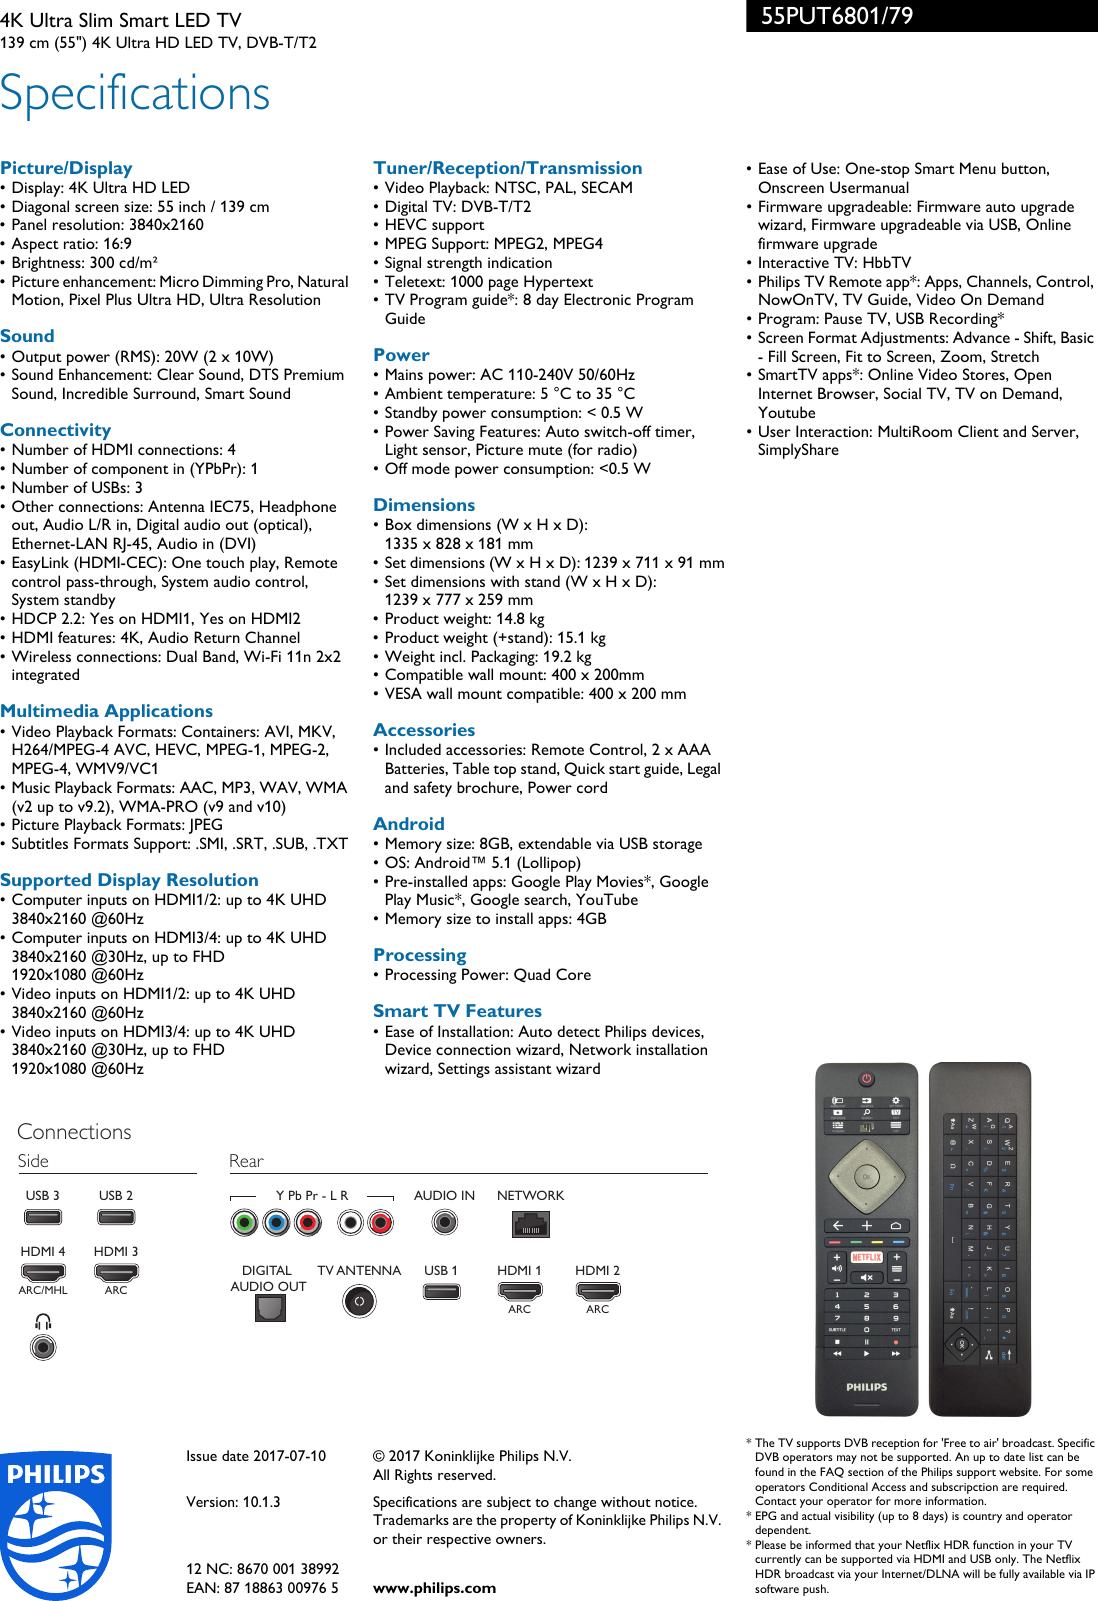 Philips 55PUT6801/79 4K Ultra Slim Smart LED TV With Pixel